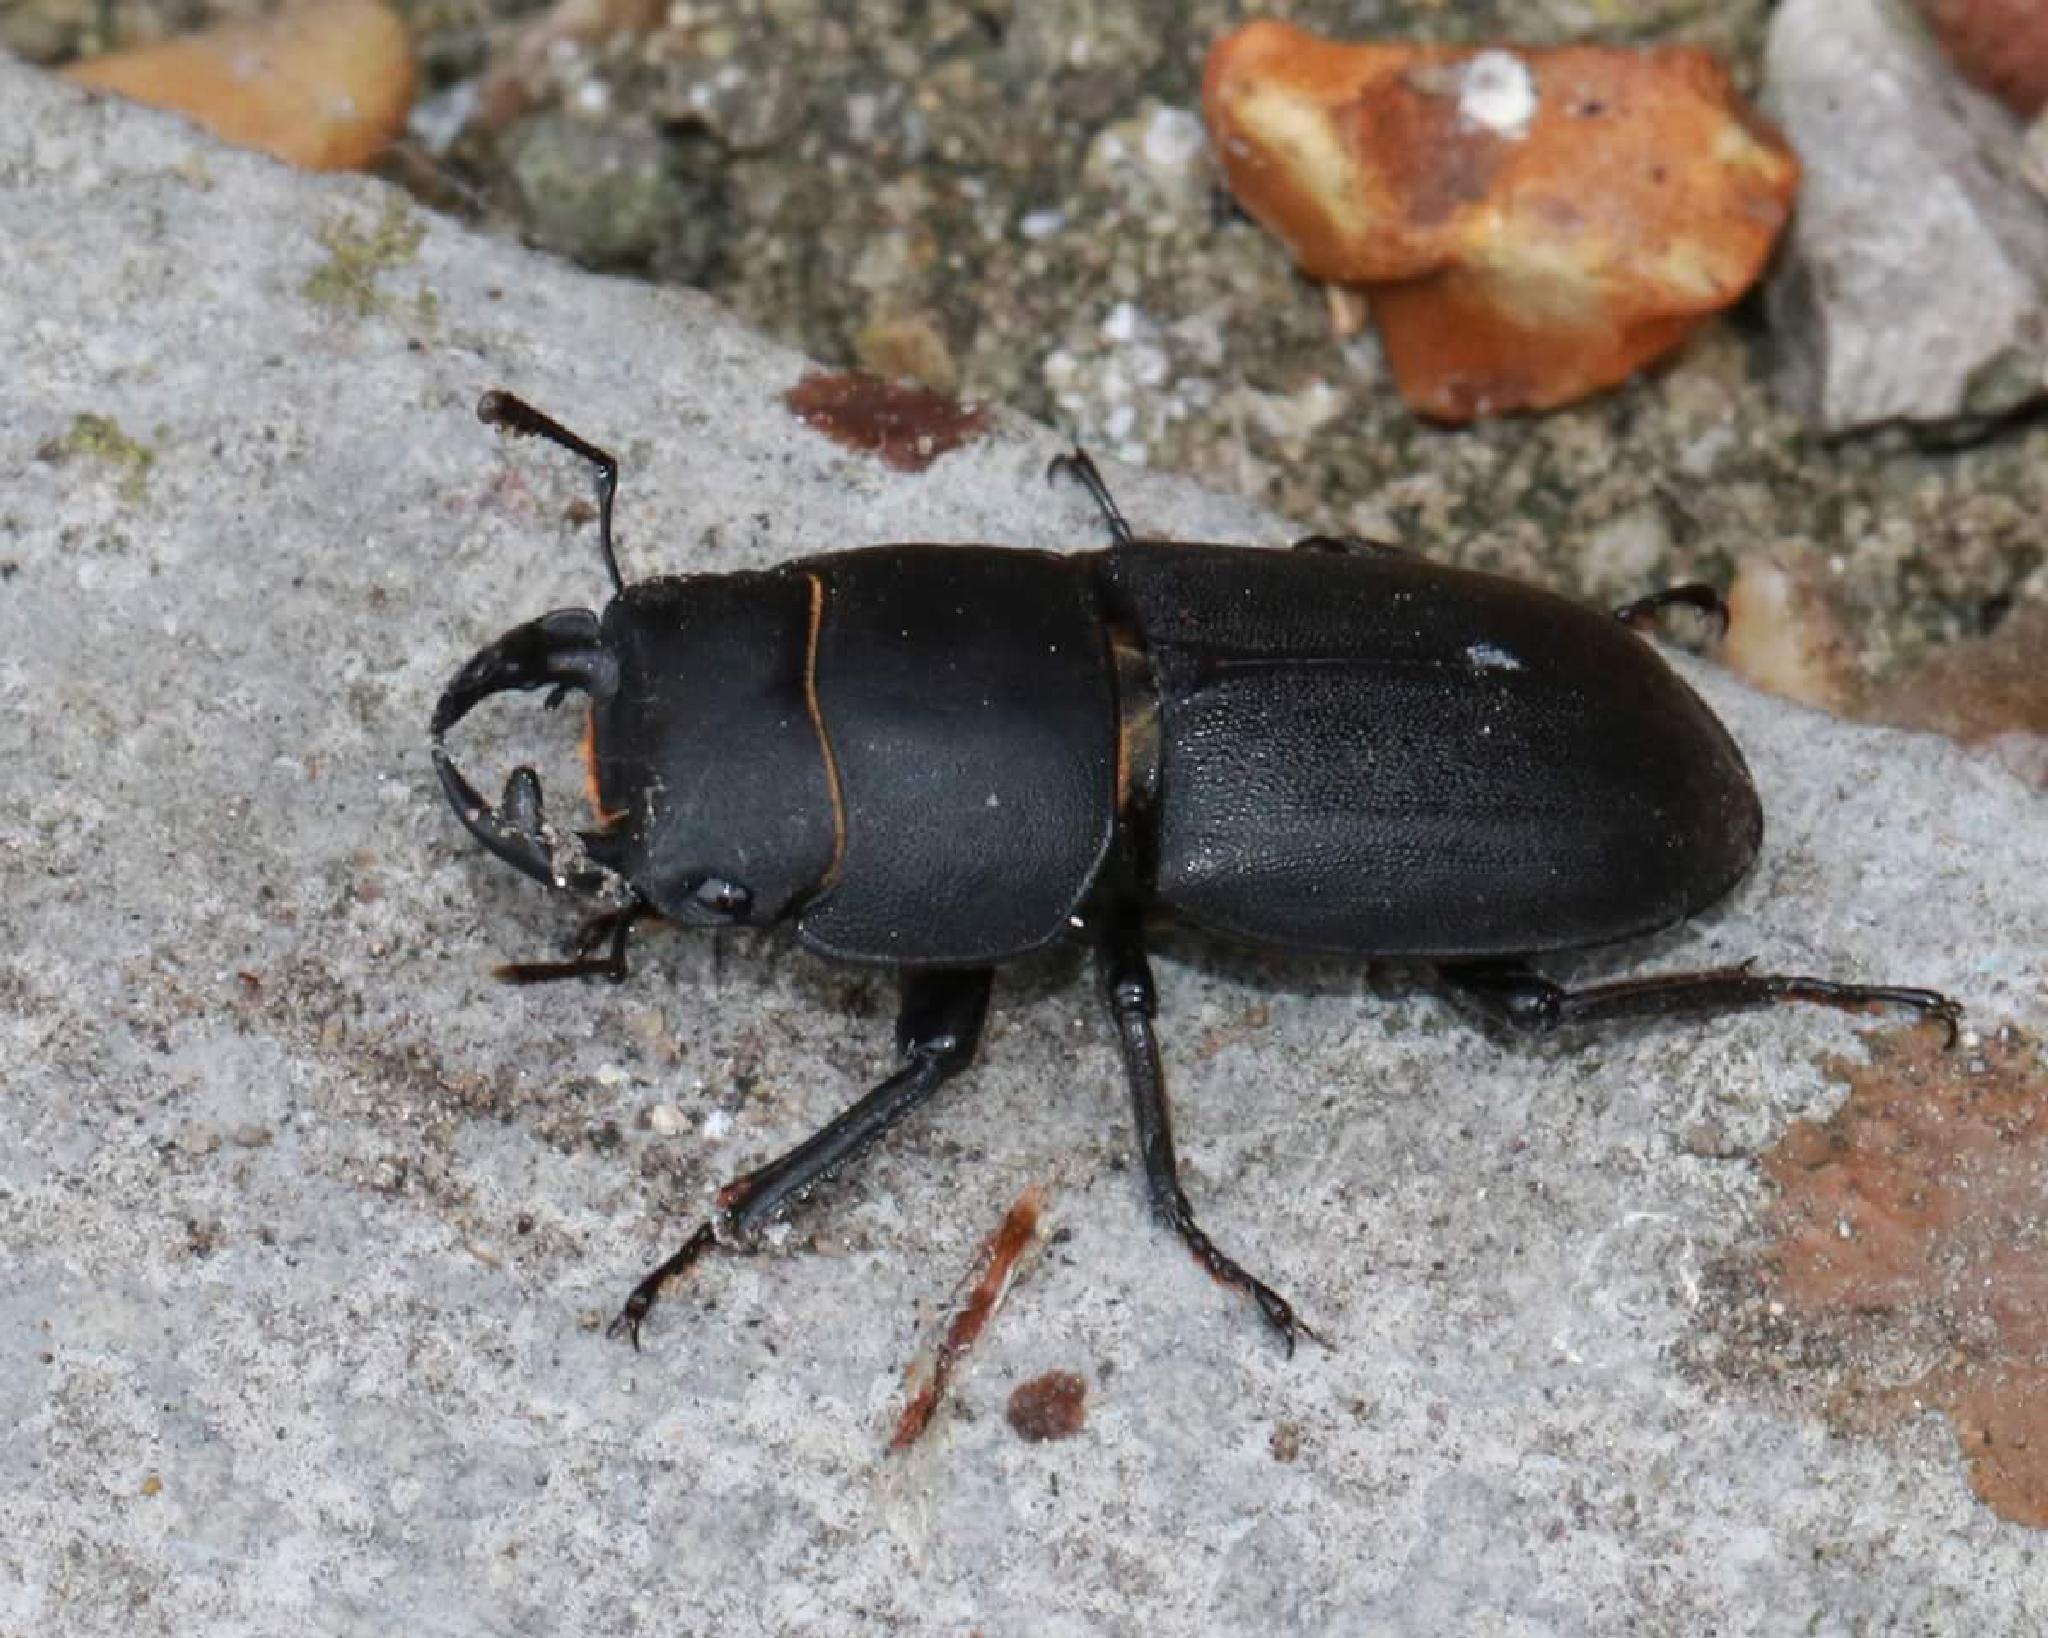 Female Stag Beetle by Nicholas Rawsthorne